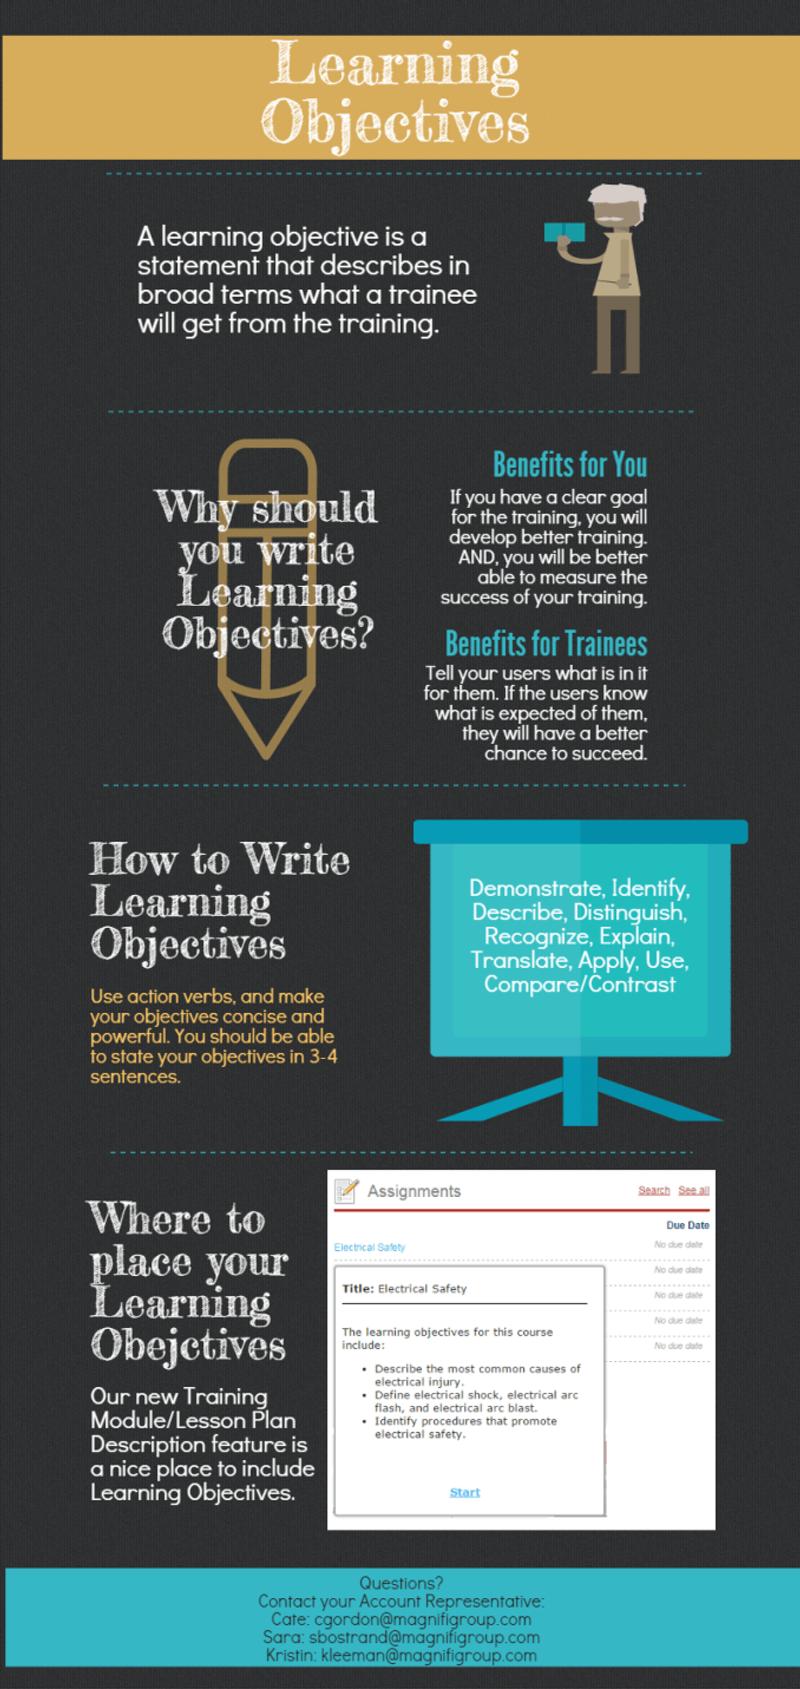 LearningObjectivesBlogPost